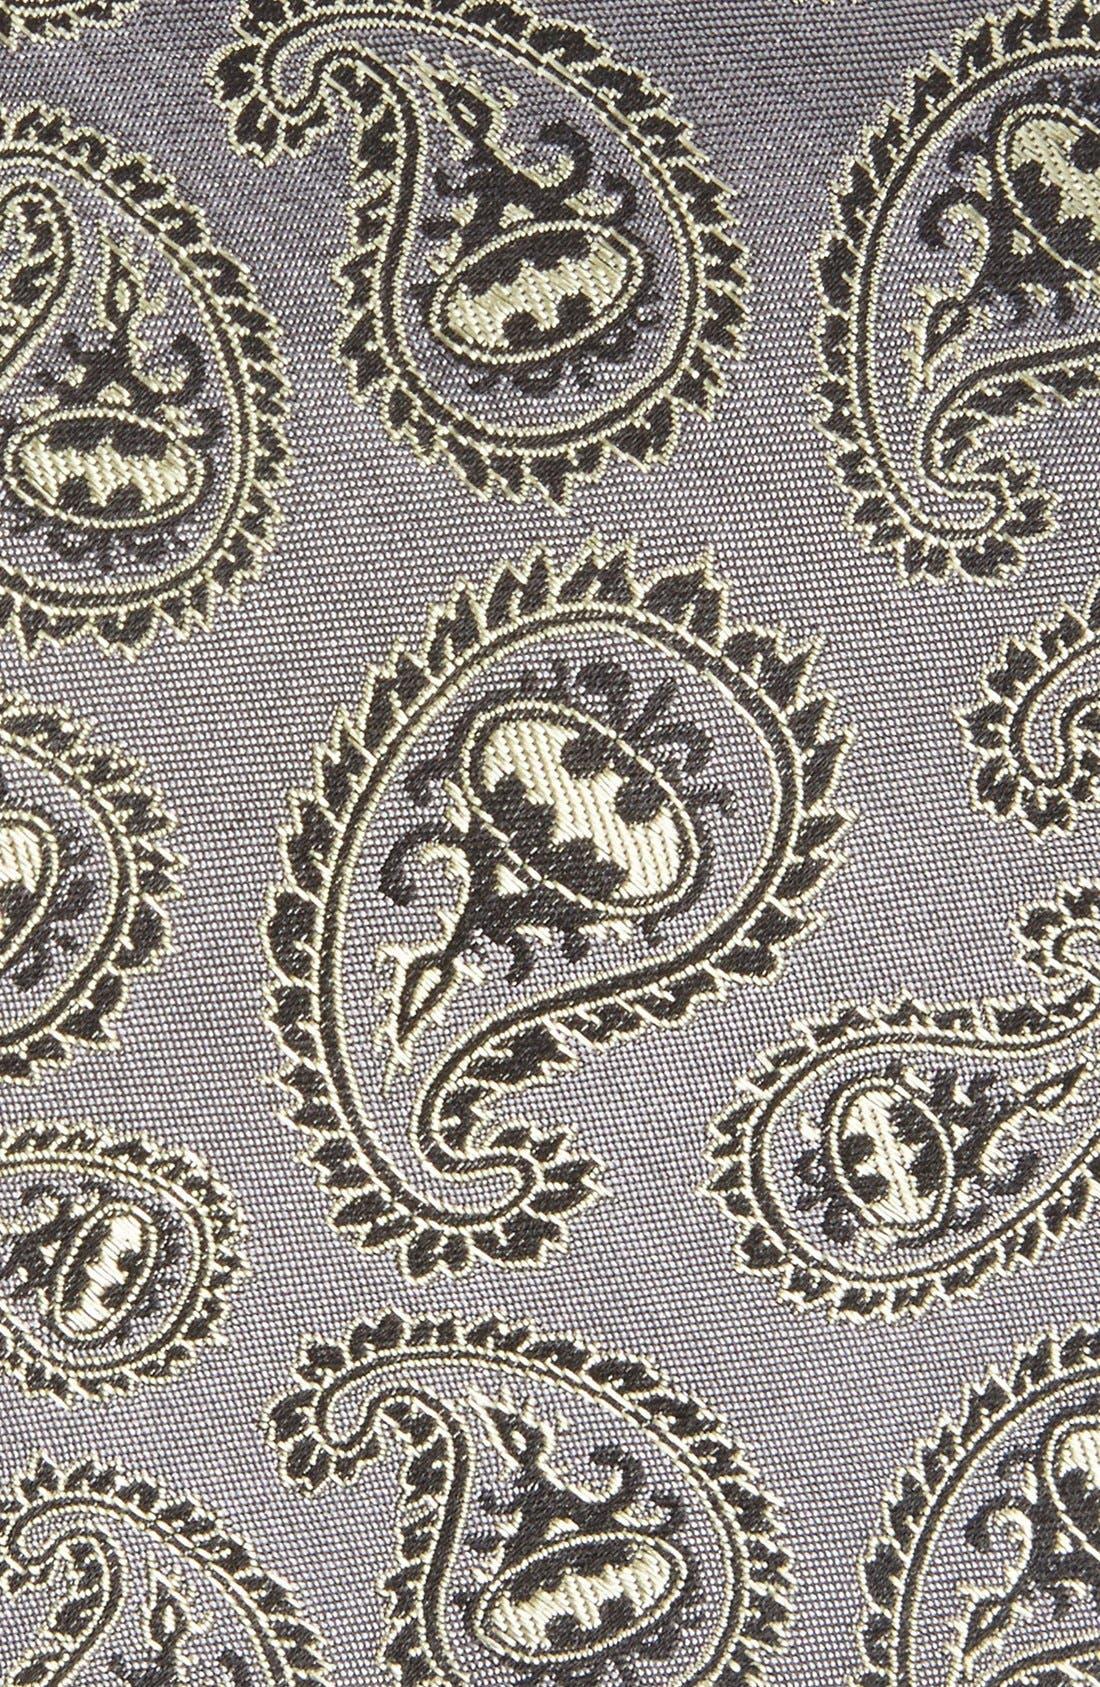 'Batman' Paisley Silk Tie,                             Alternate thumbnail 2, color,                             Grey